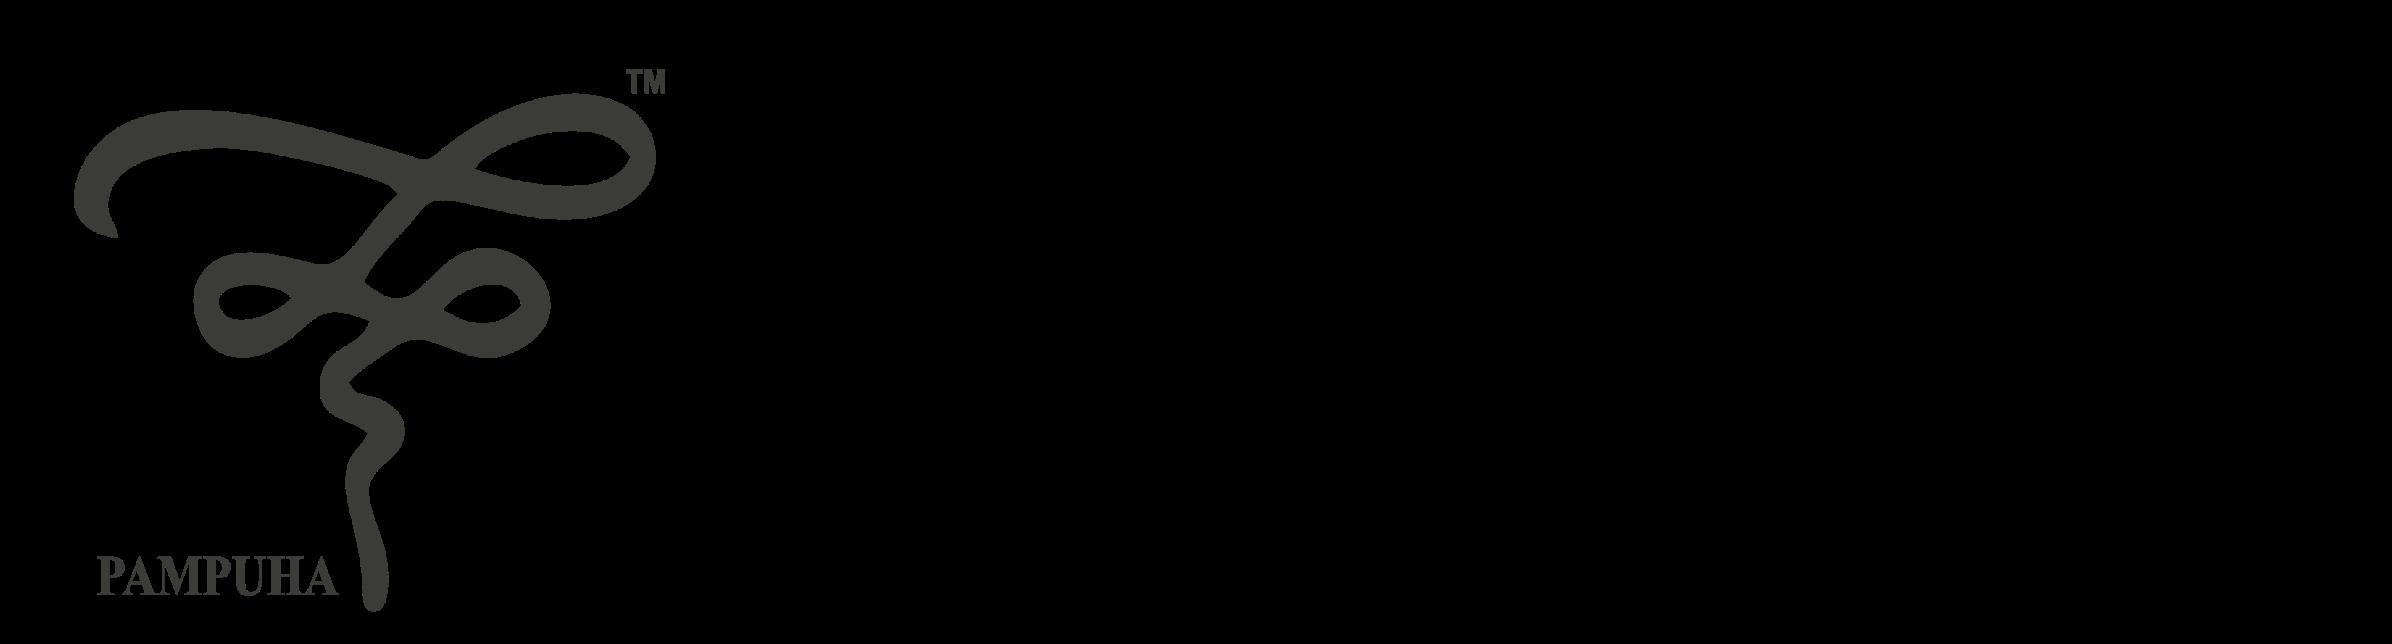 Официальный сайт Мастера-кузнеца Пампуха И.Ю.